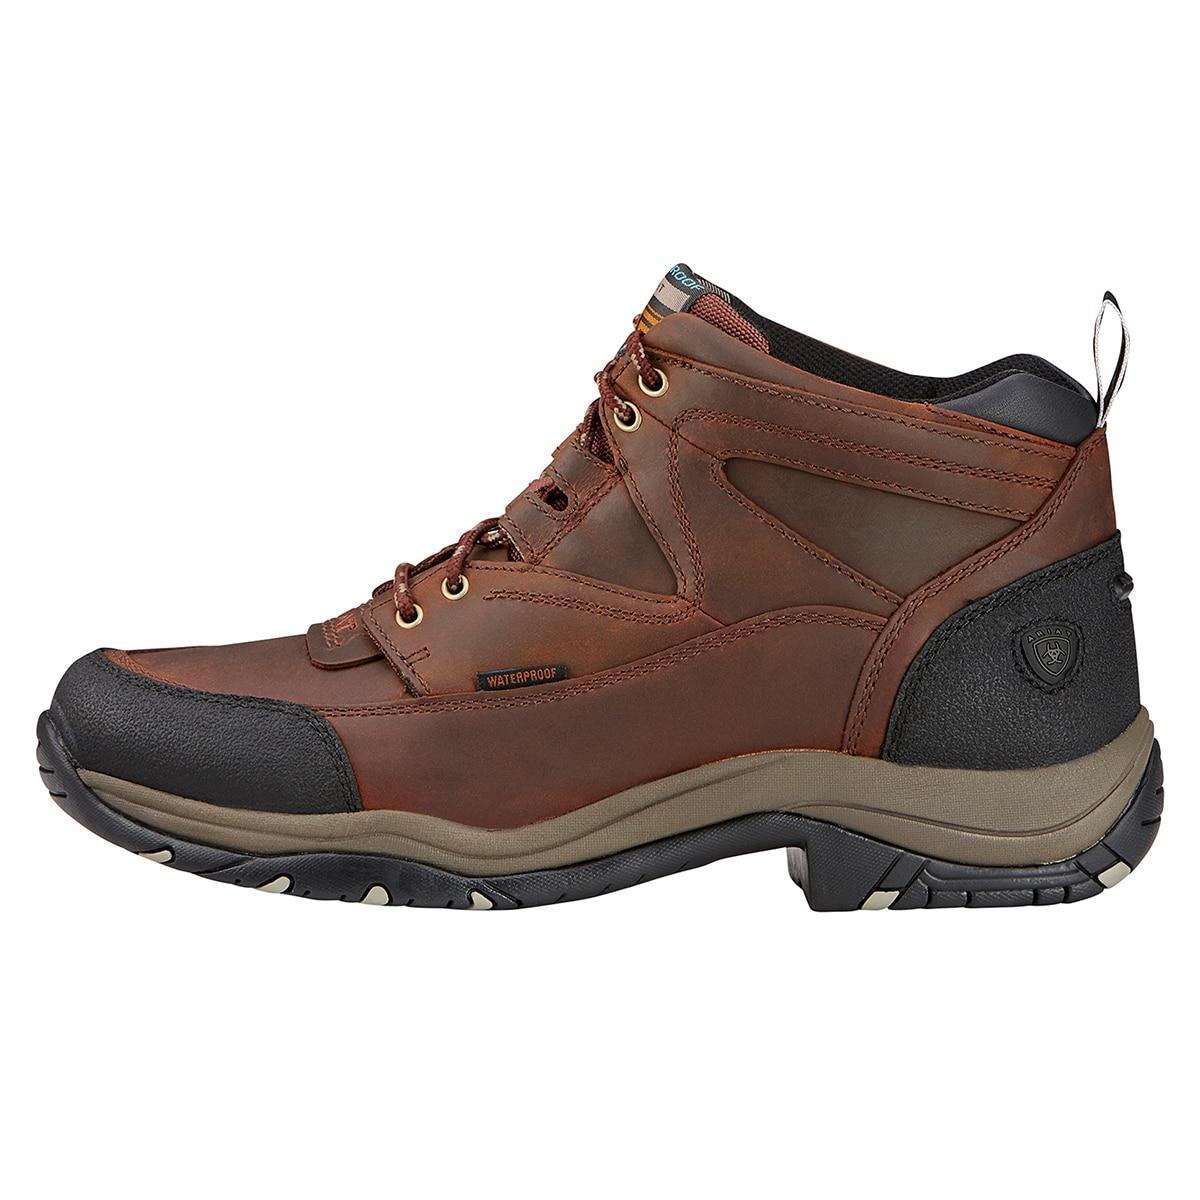 44103f3c3a9 Ariat® Men's Terrain H20 - Waterproof